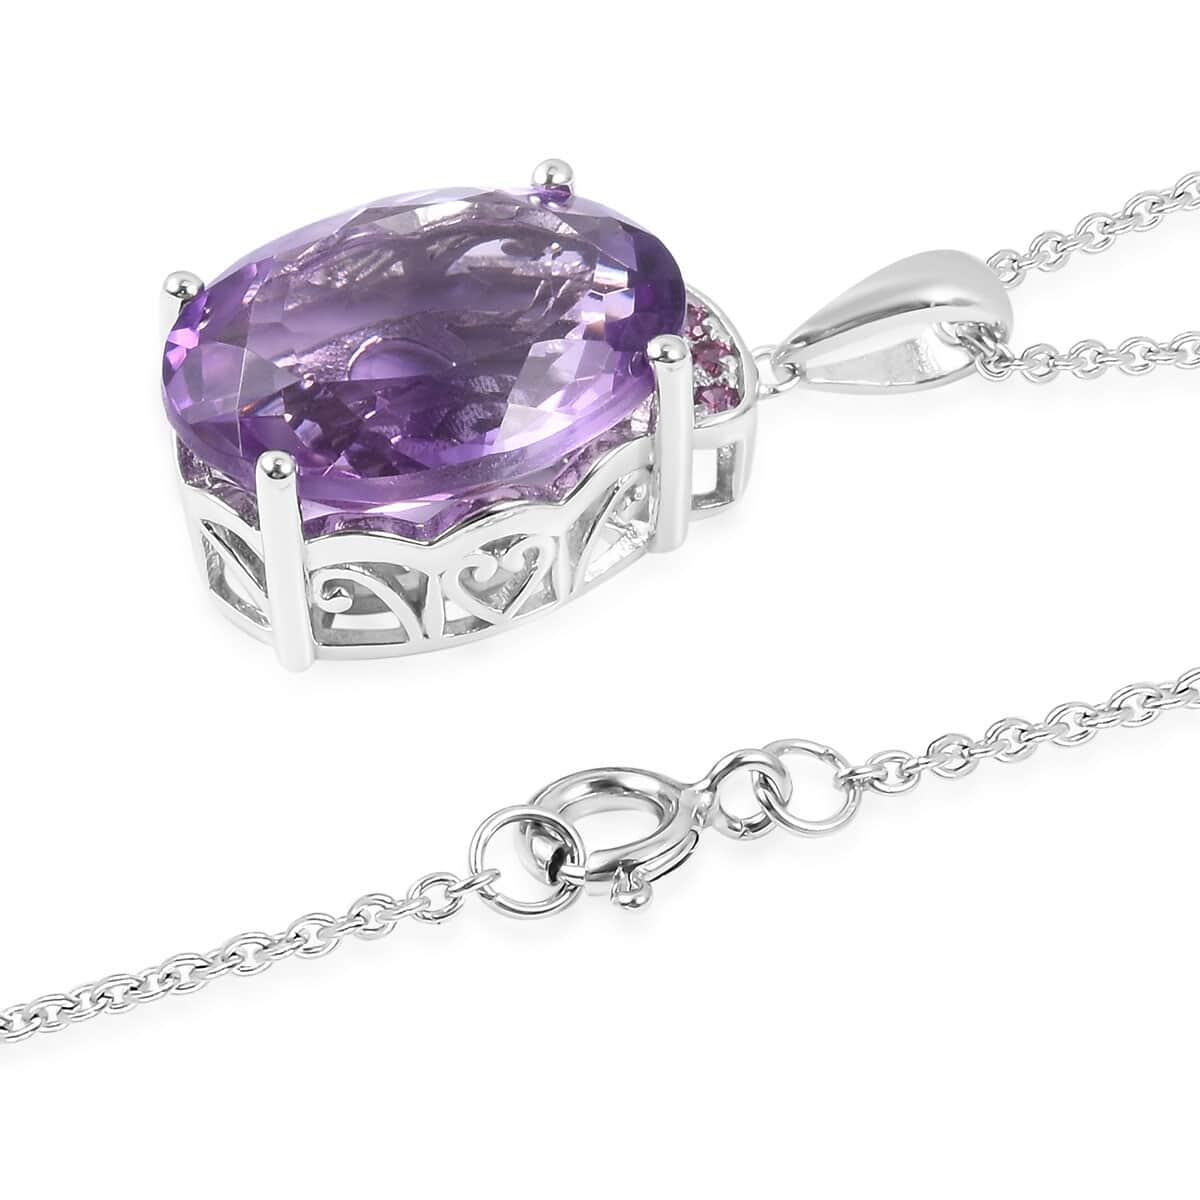 Bolivian Amethyst, Orissa Rhodolite Garnet Pendant Necklace (18 in) in Sterling Silver 8.35 ctw